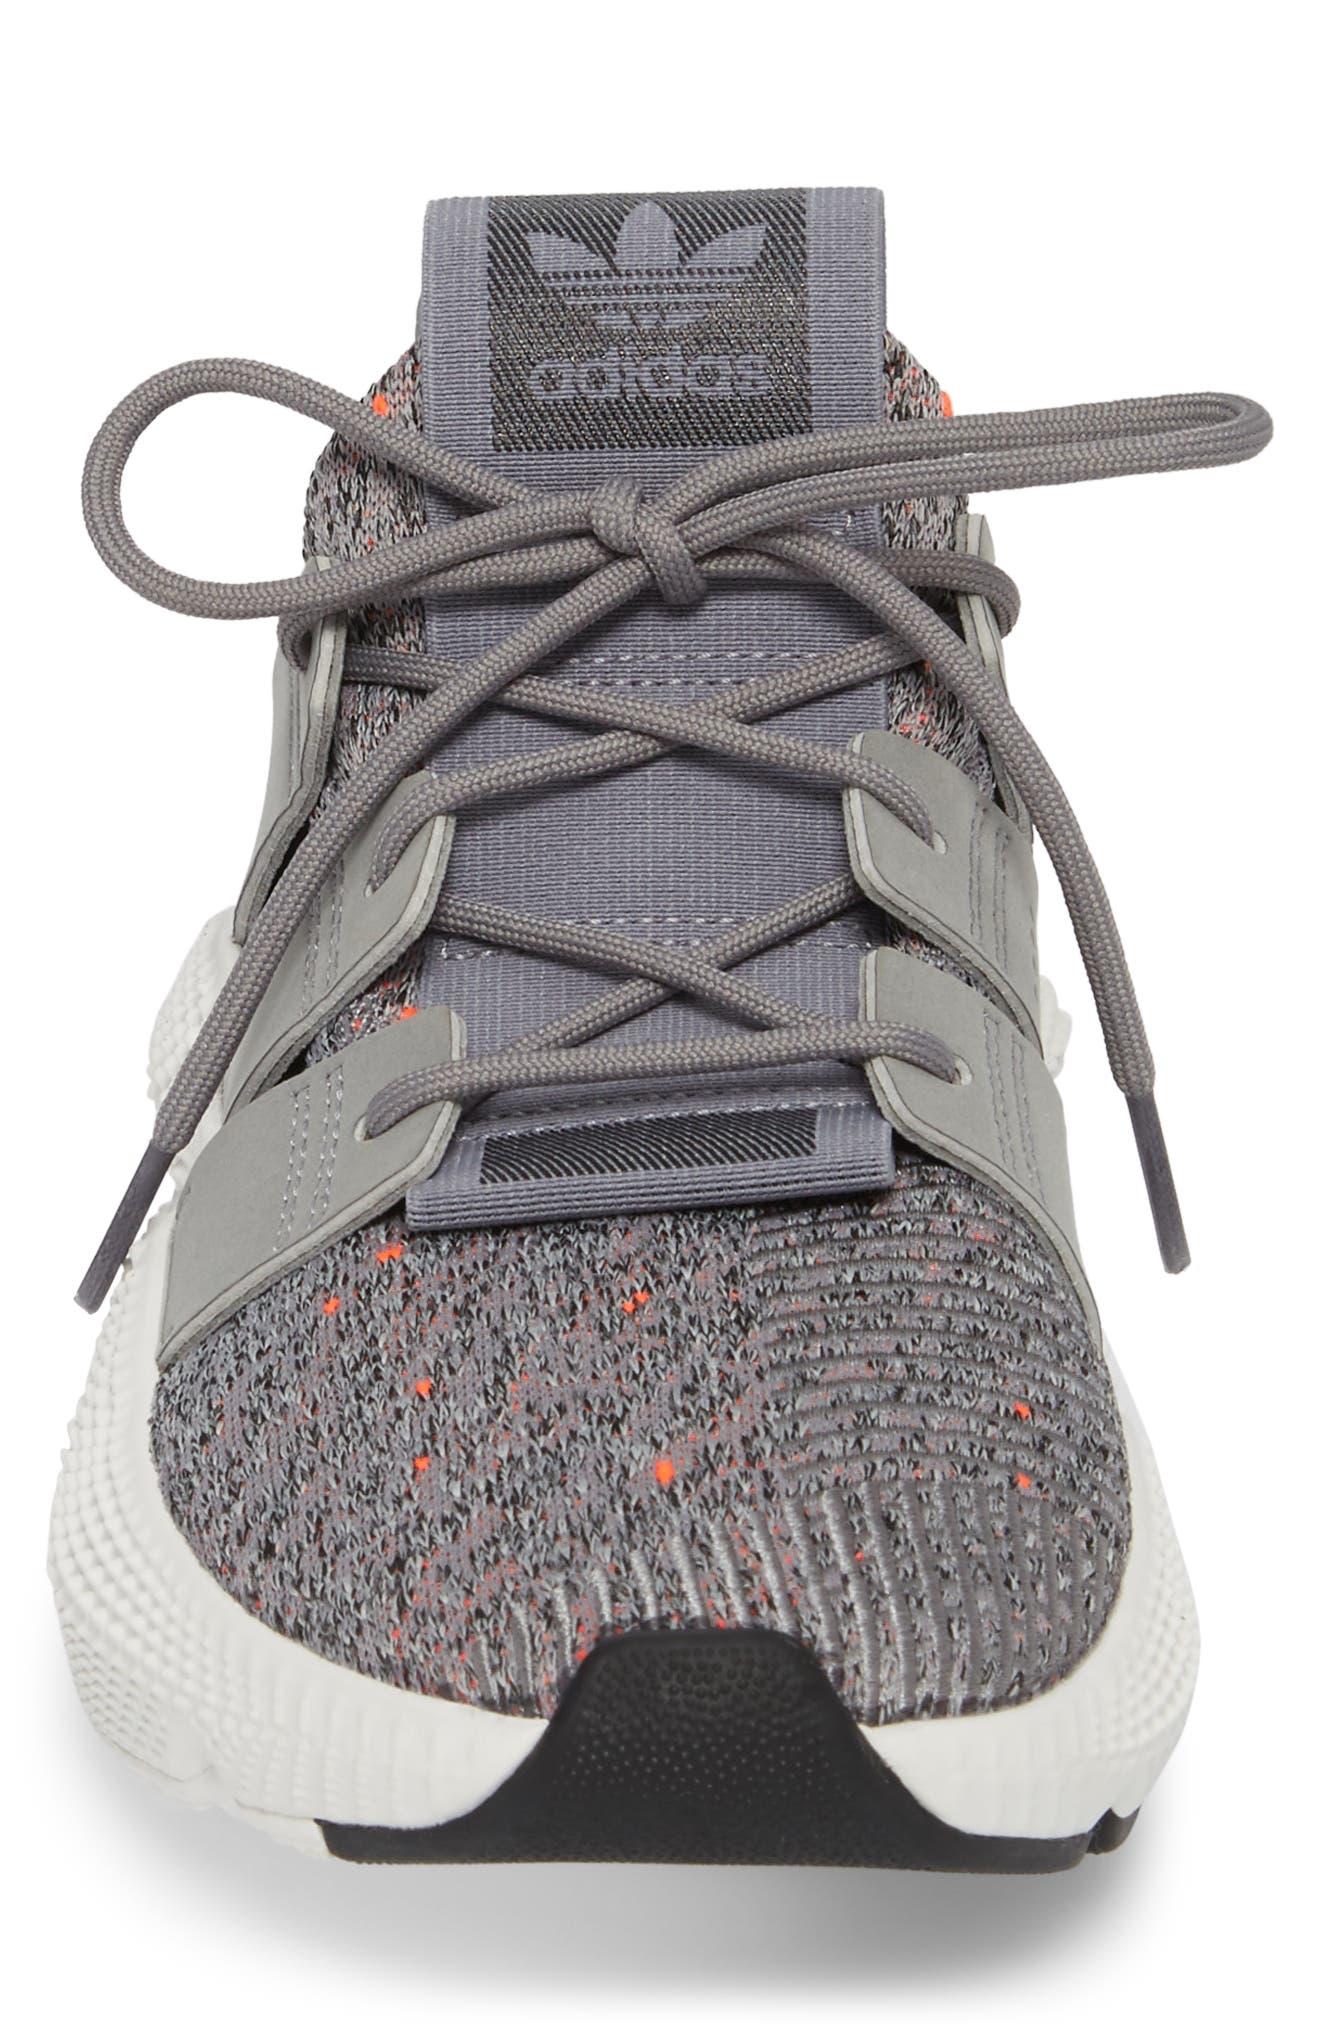 Prophere Sneaker,                             Alternate thumbnail 4, color,                             Grey/ White/ Solar Red